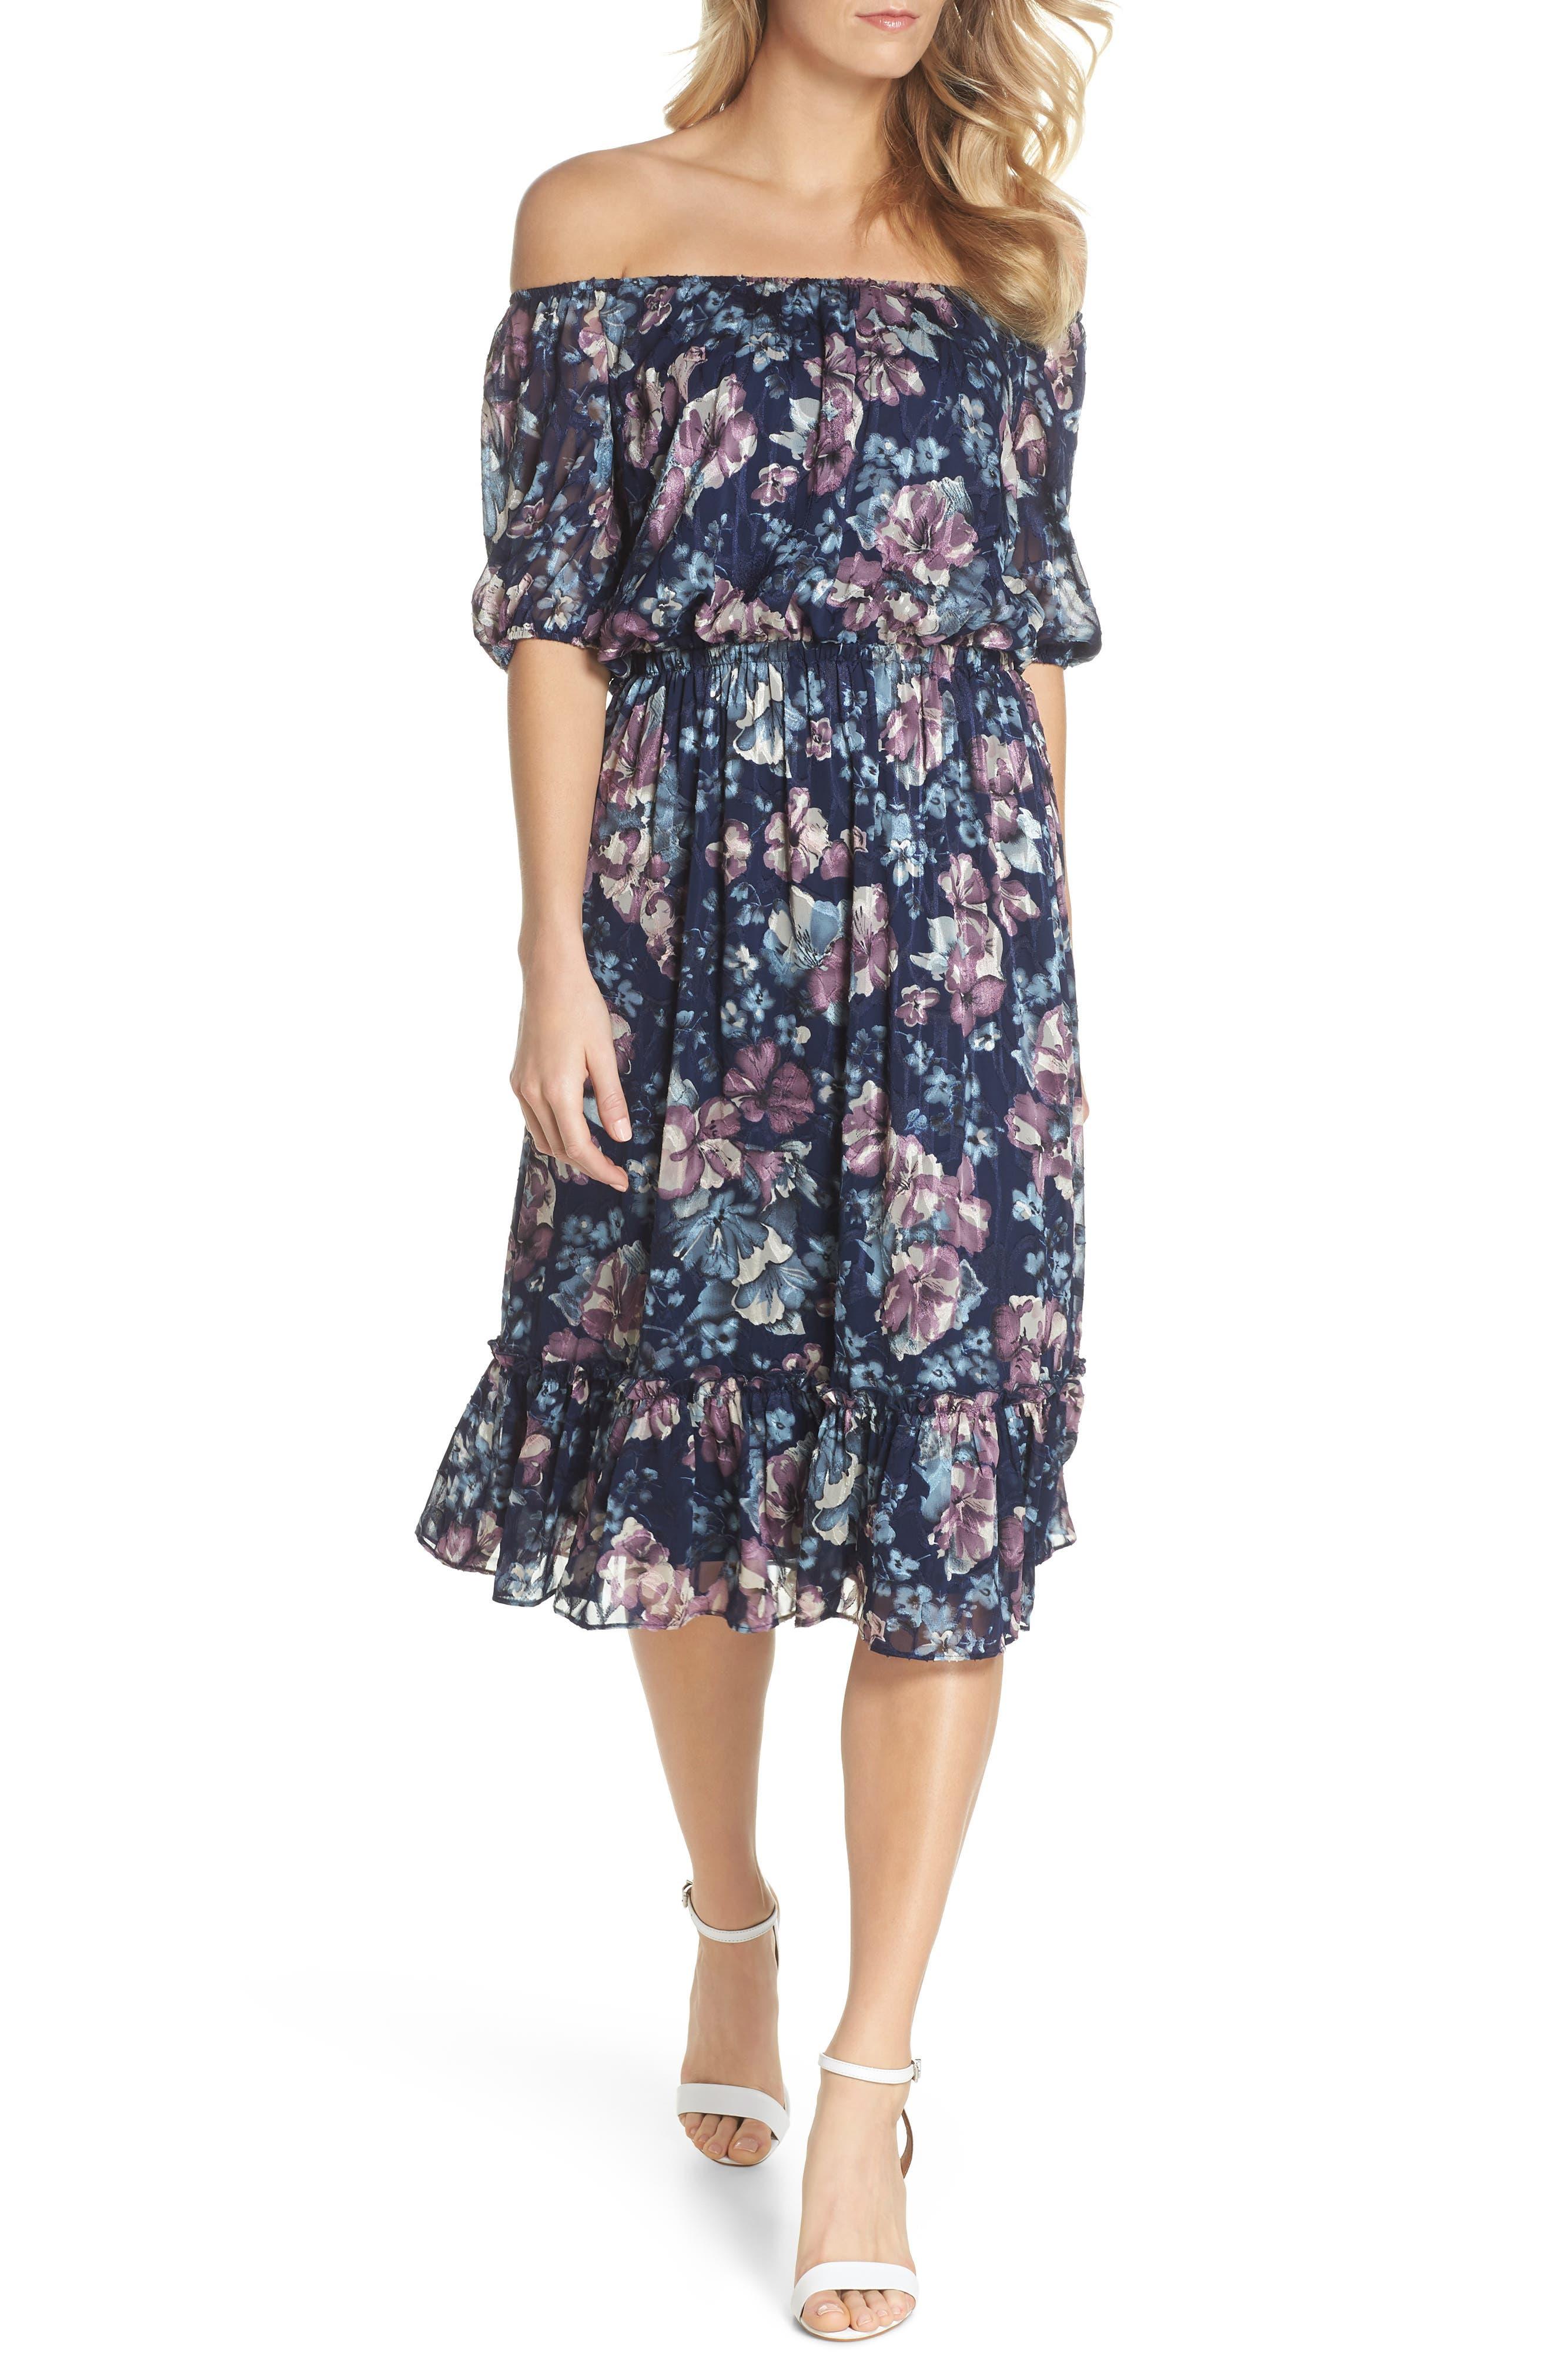 Adrianna Papell Floral Burnout Off the Shoulder Blouson Dress